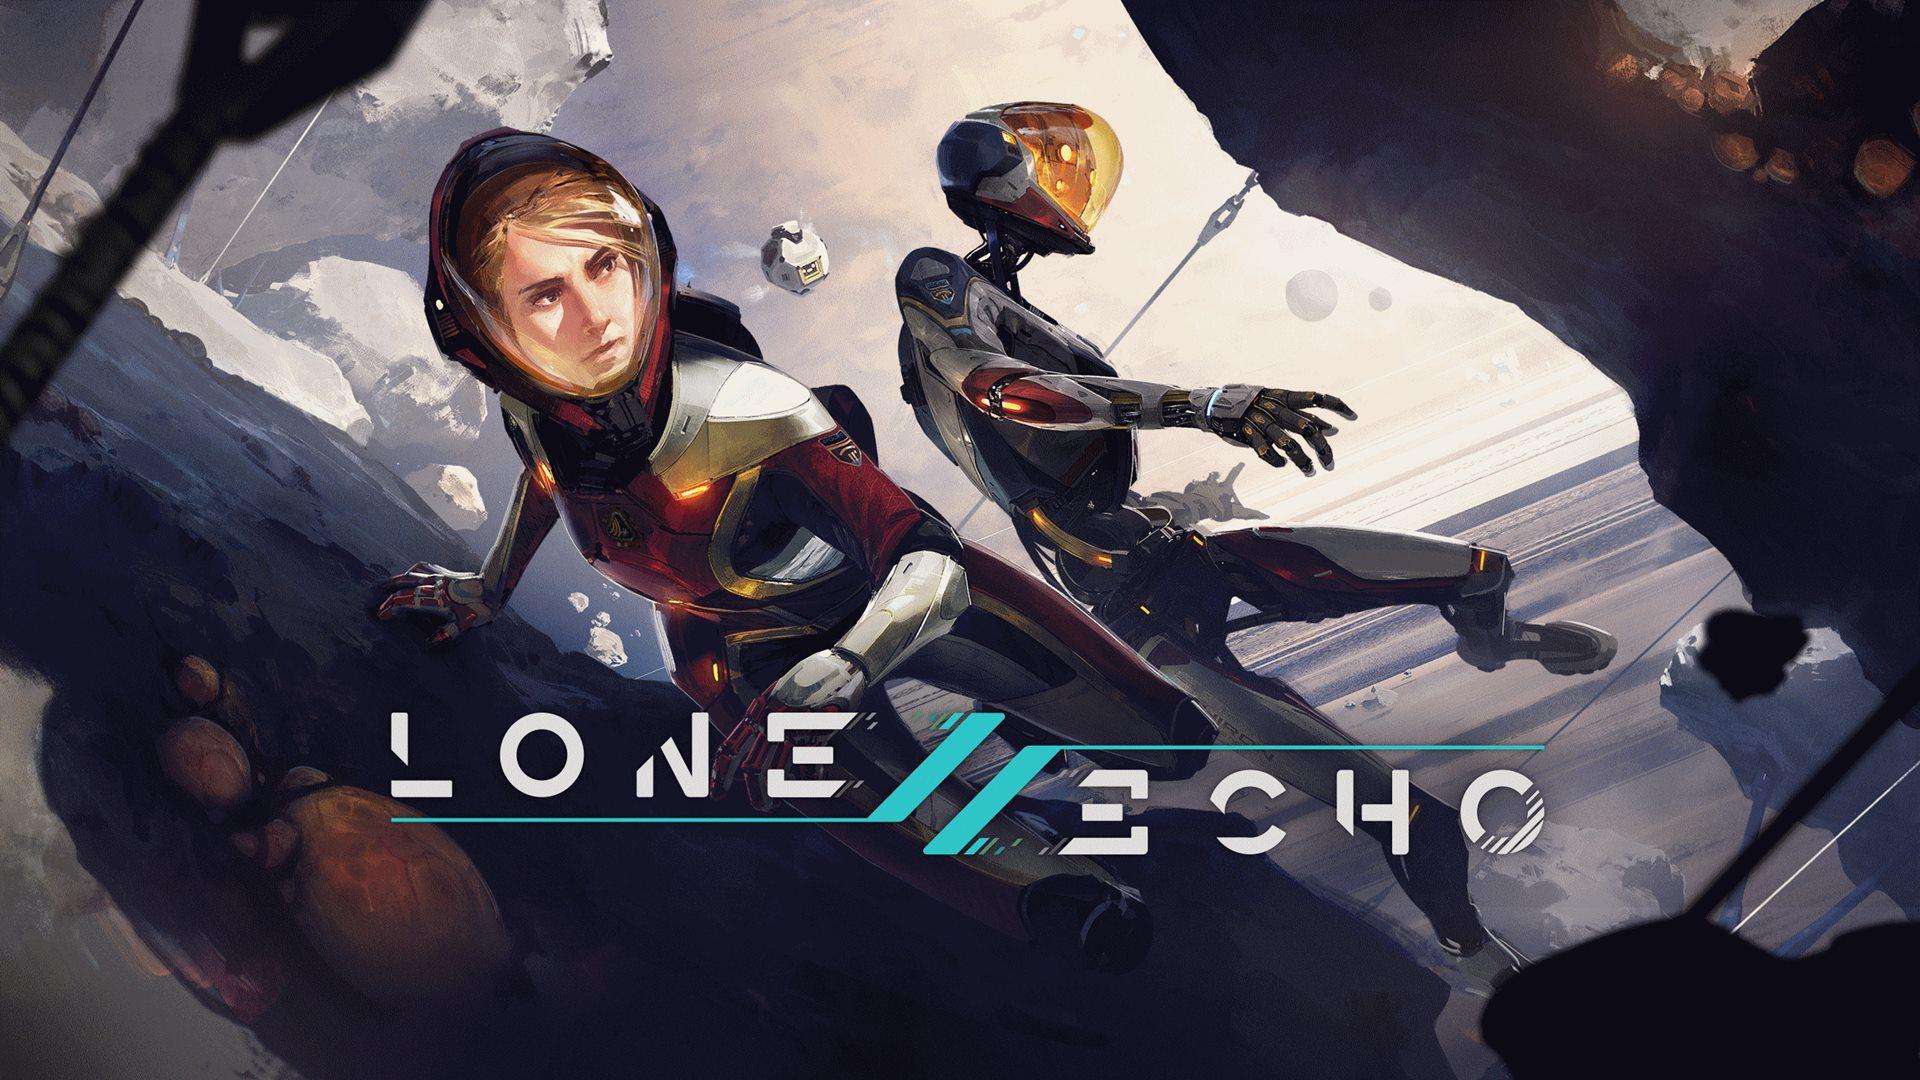 Lone echo II uscita